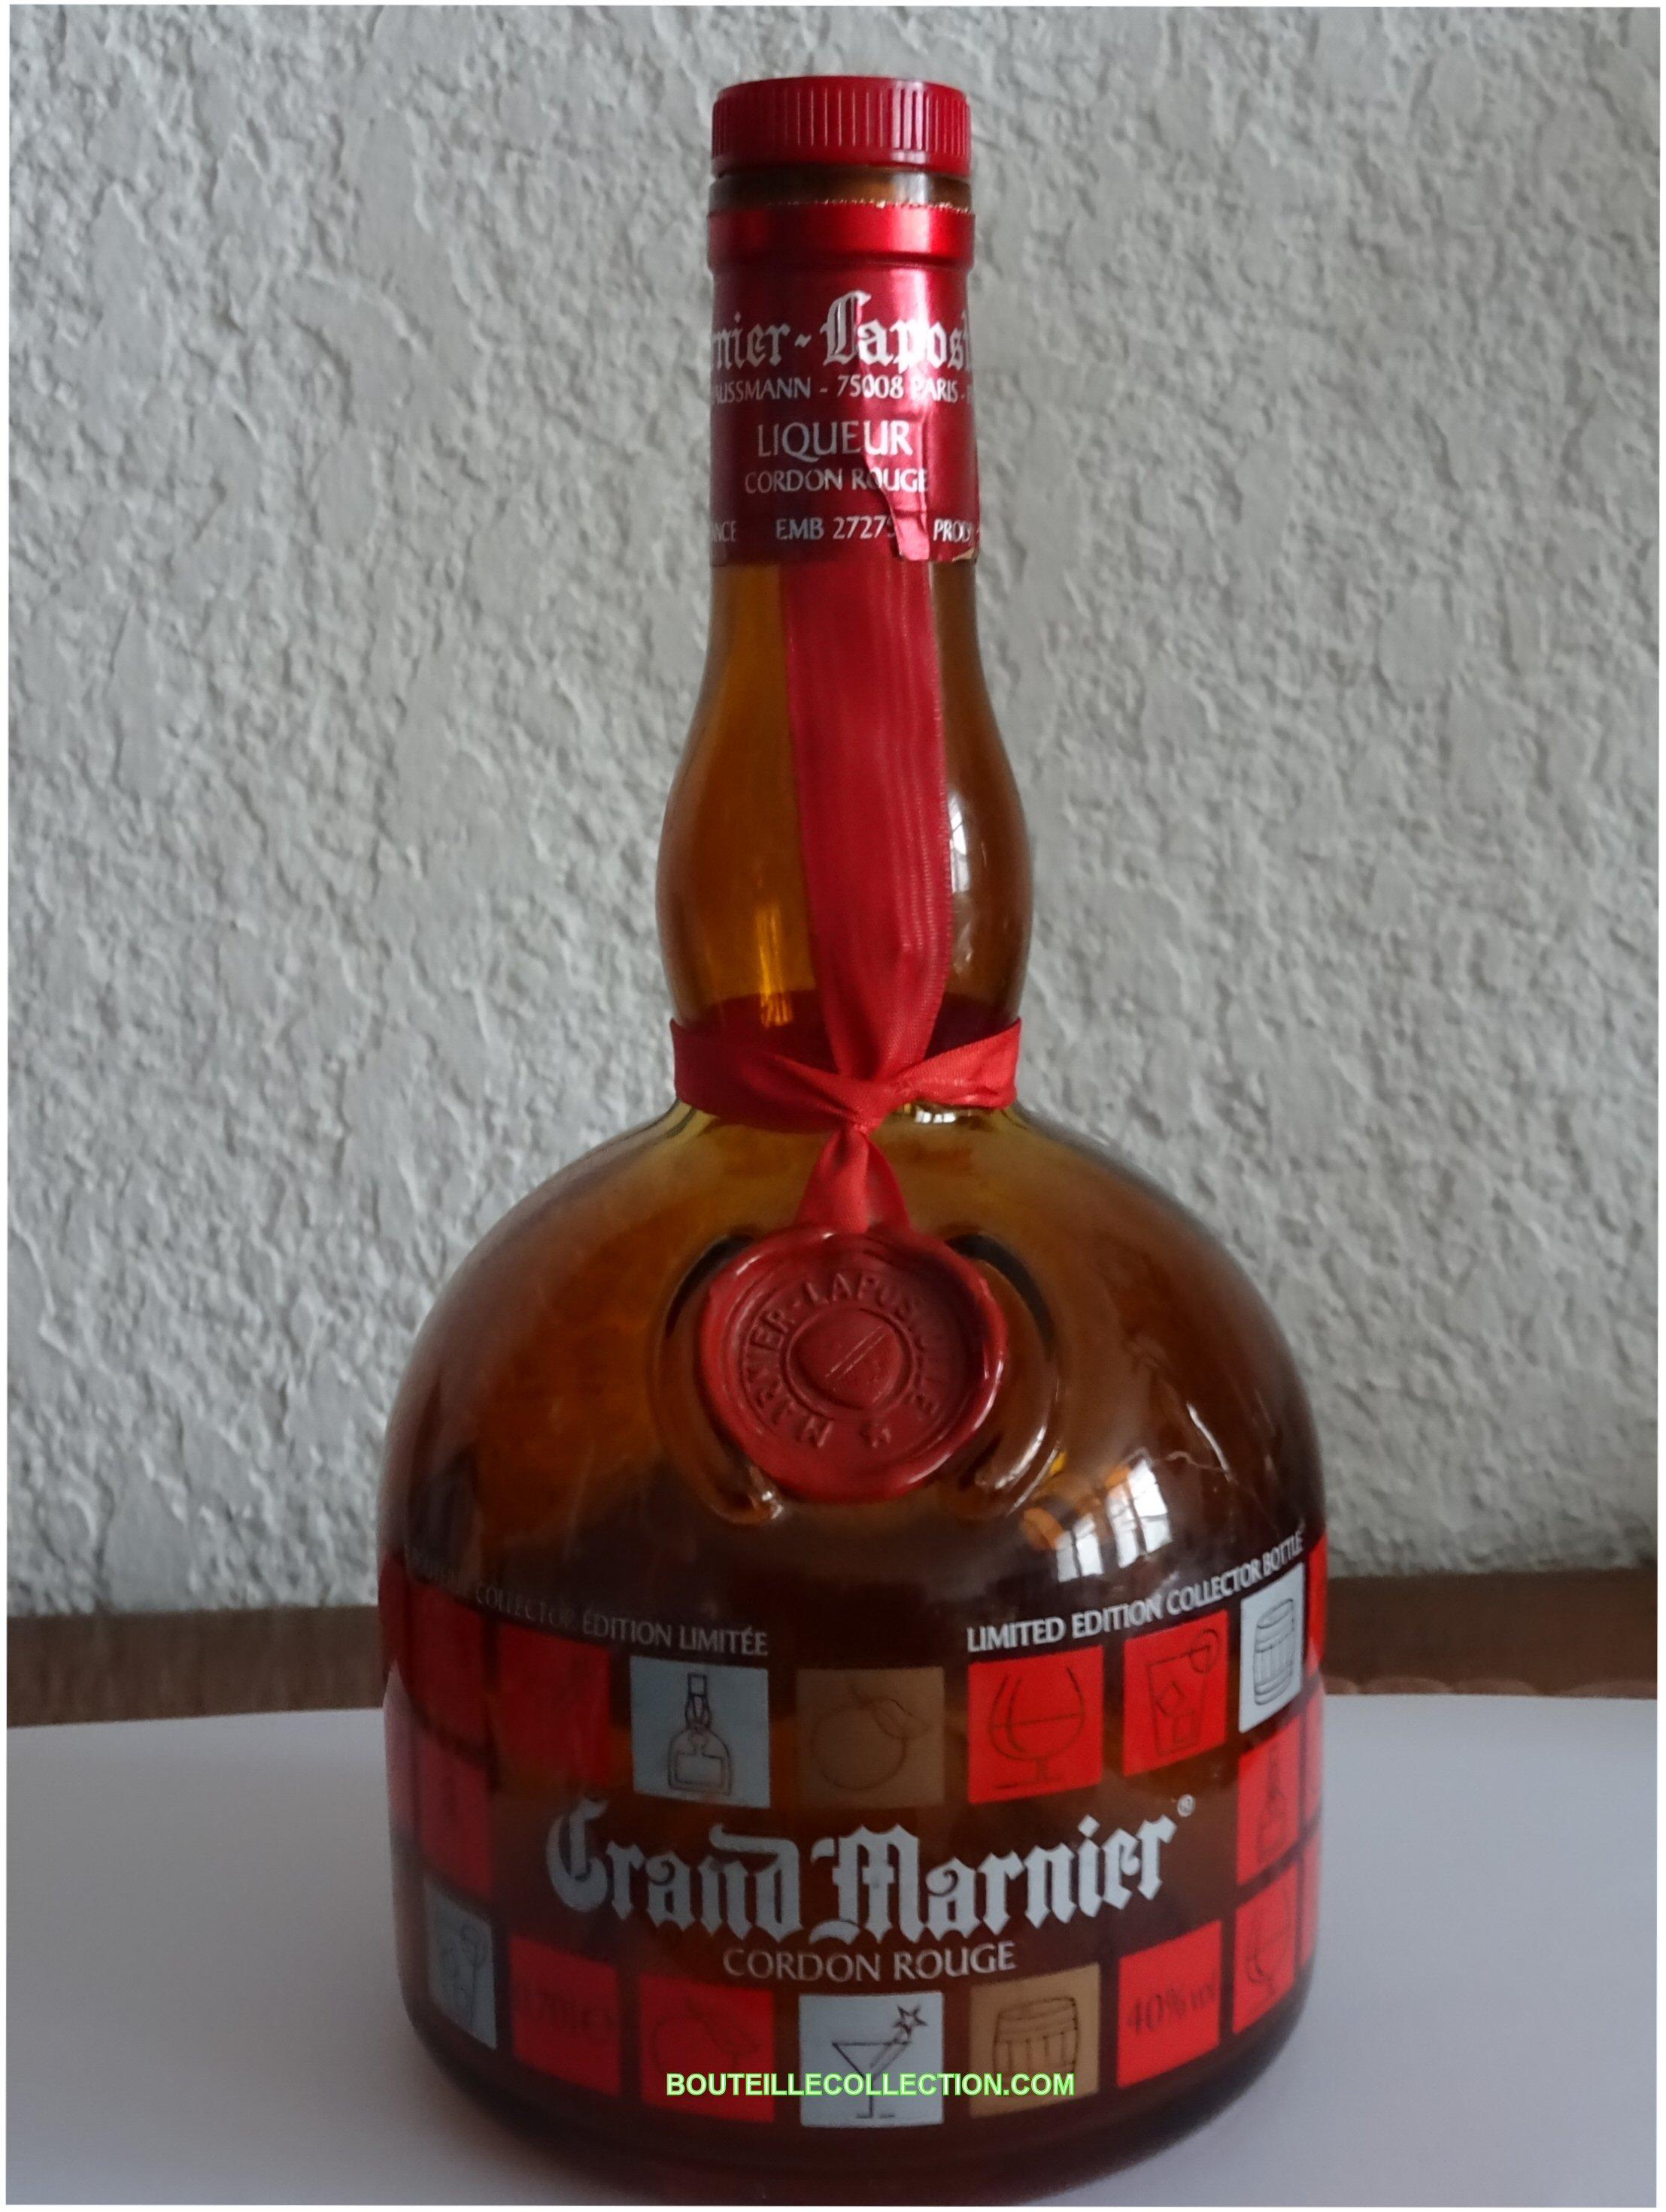 GRAND MARNIER GORDEN ROUGE 70CL B  .JPG